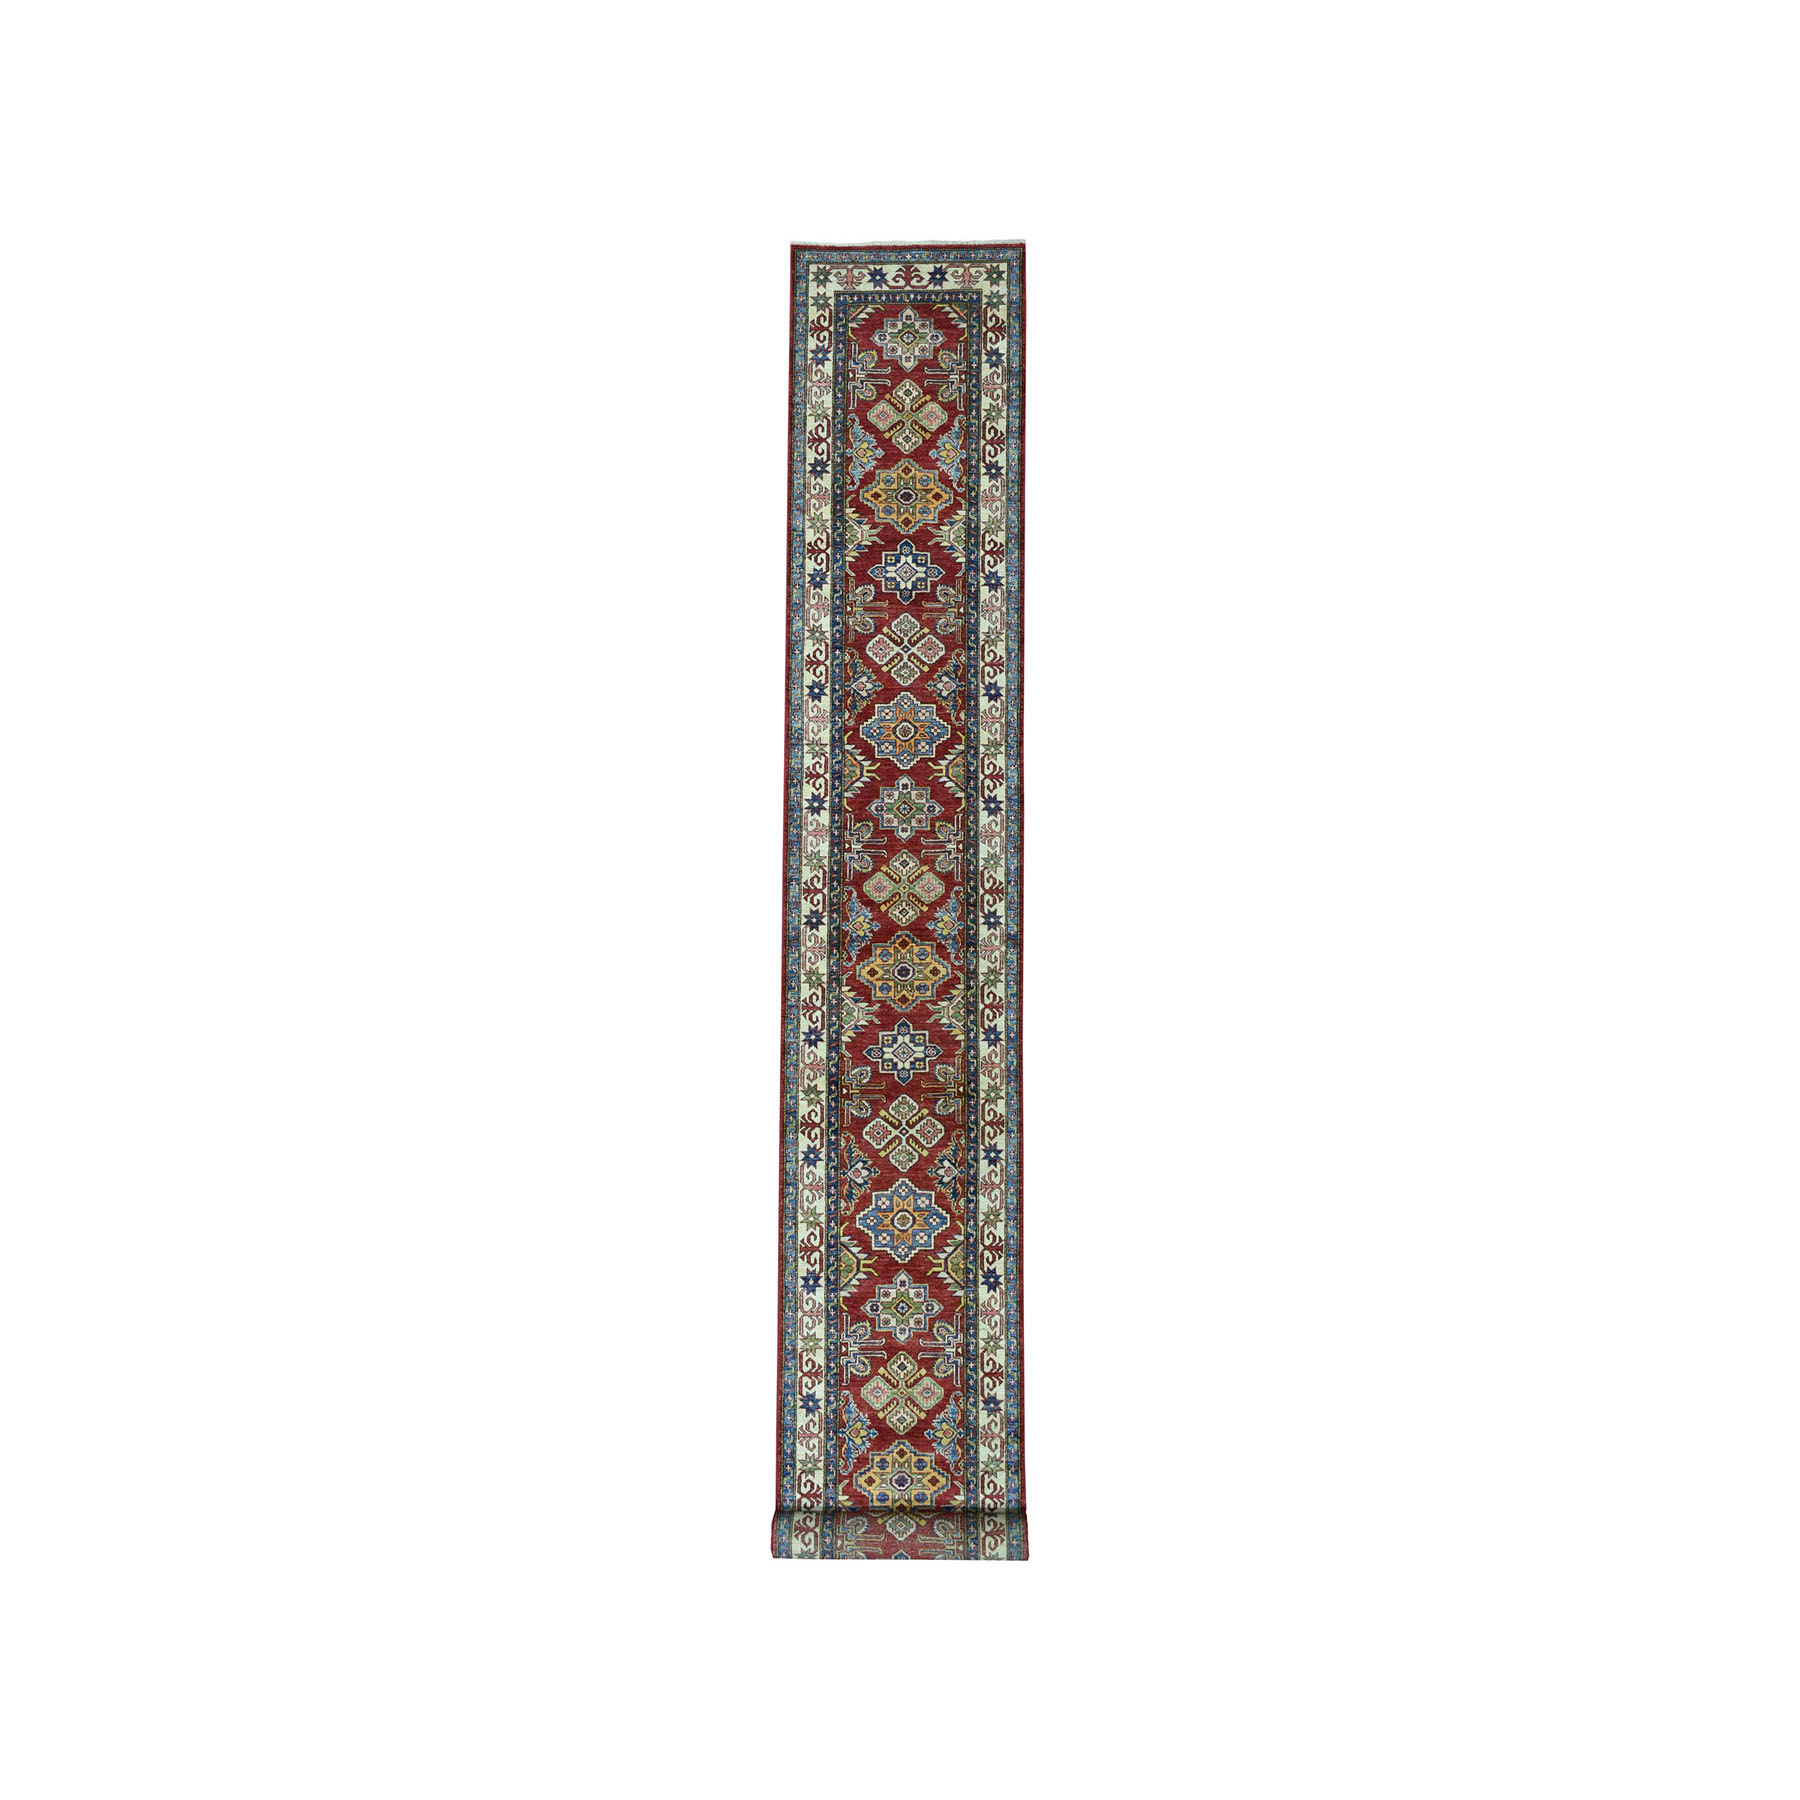 "2'4""x18' Red Super Kazak Geometric Design XL Runner Pure Wool Hand-Knotted Oriental Rug"